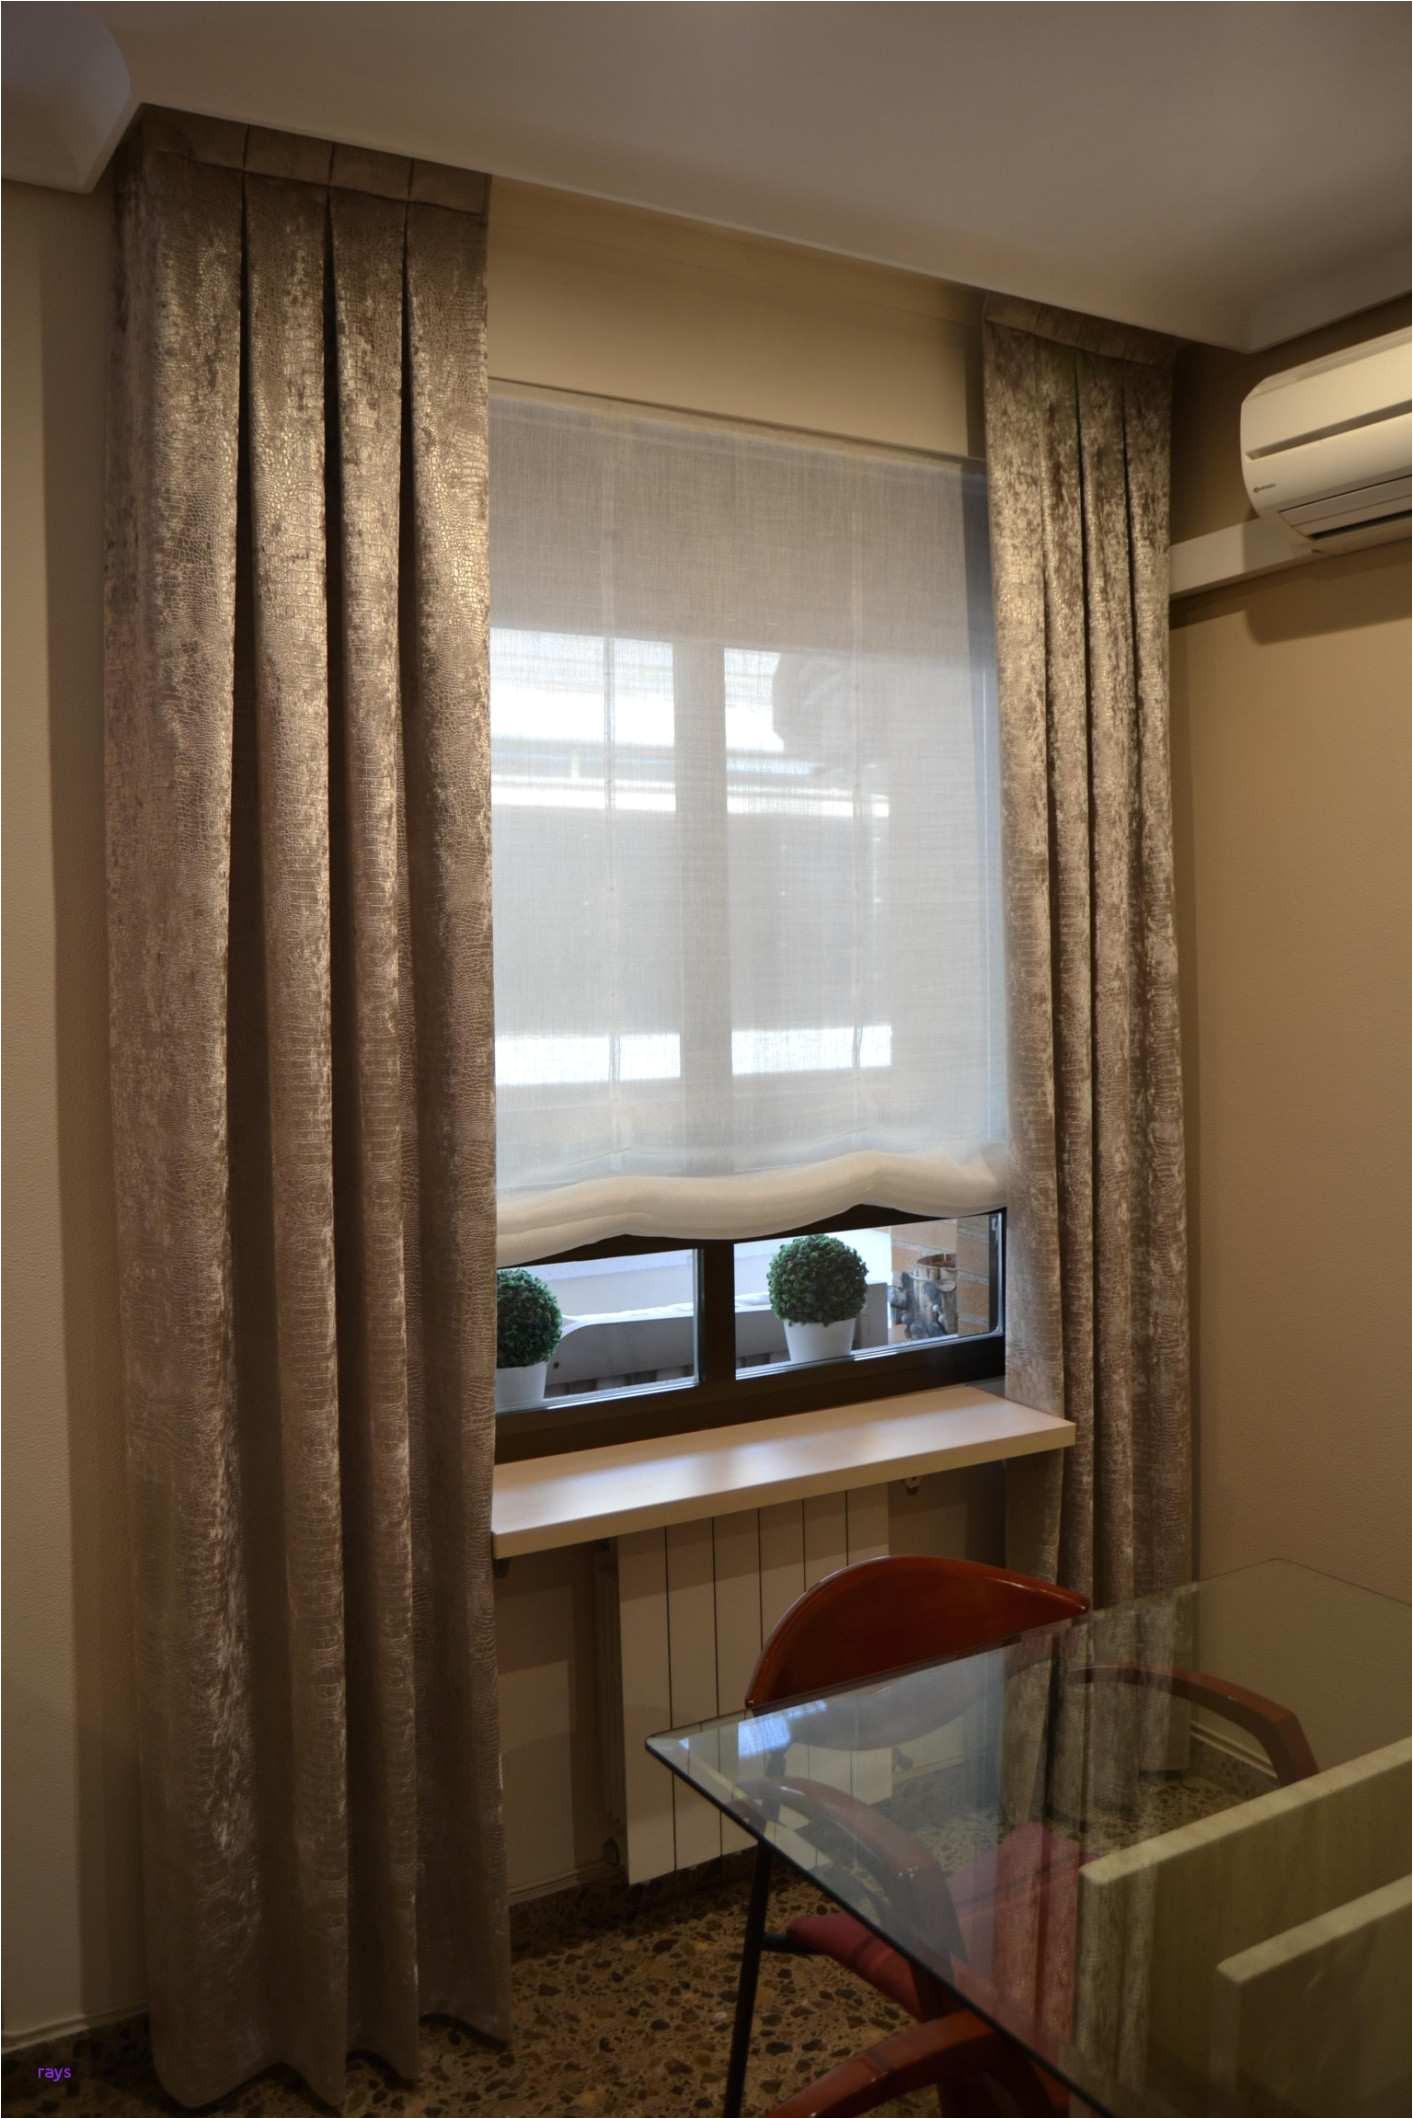 cortinas para el salon modernas lujo elegante cortinas de salon modernas fiesta de lamusica medellin